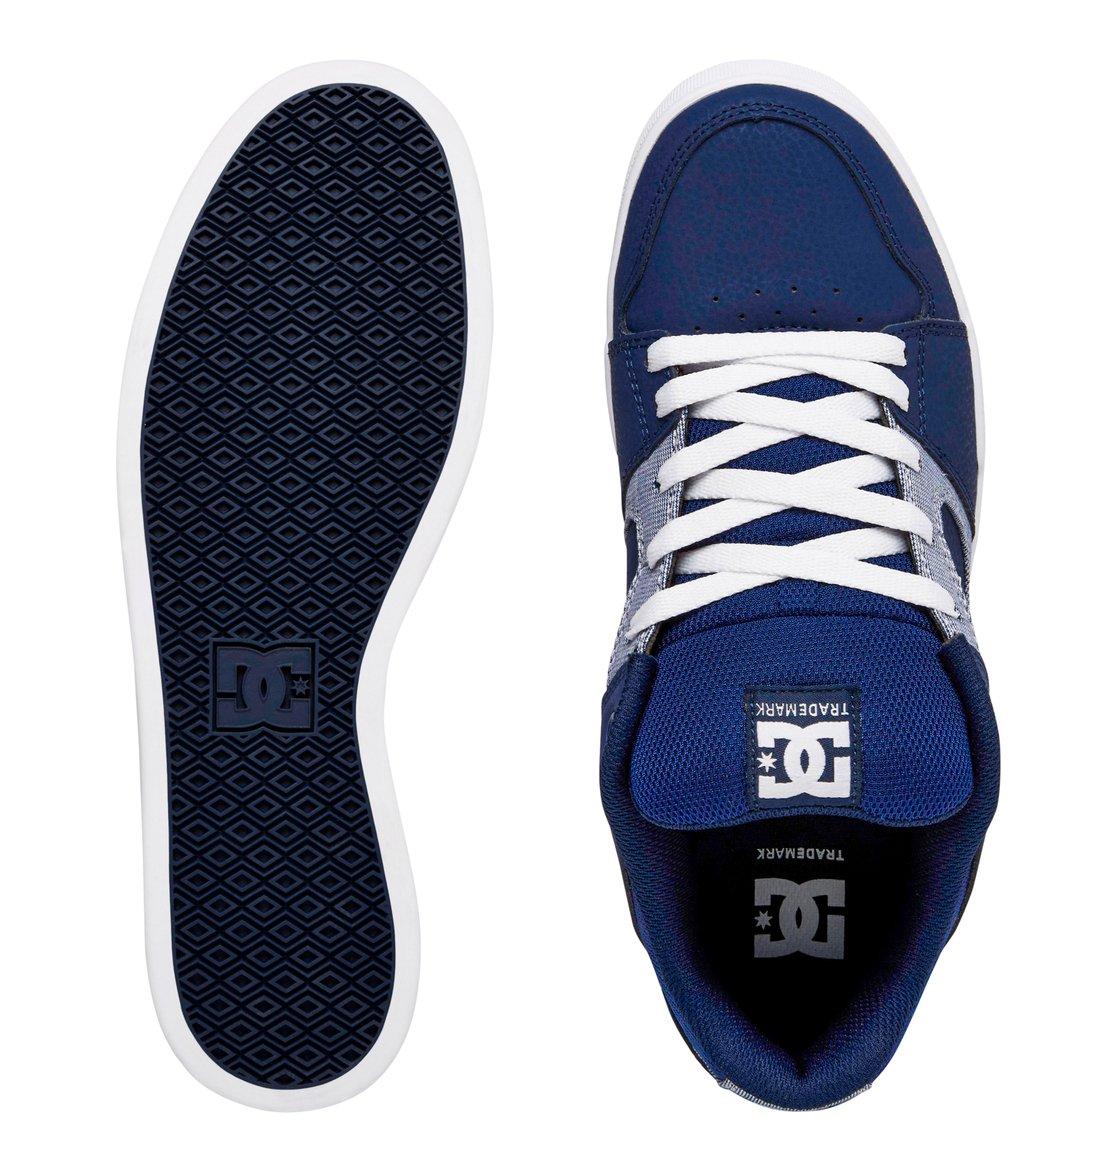 fd5733d834 3 BLITZ II ADYS100091 DC Shoes